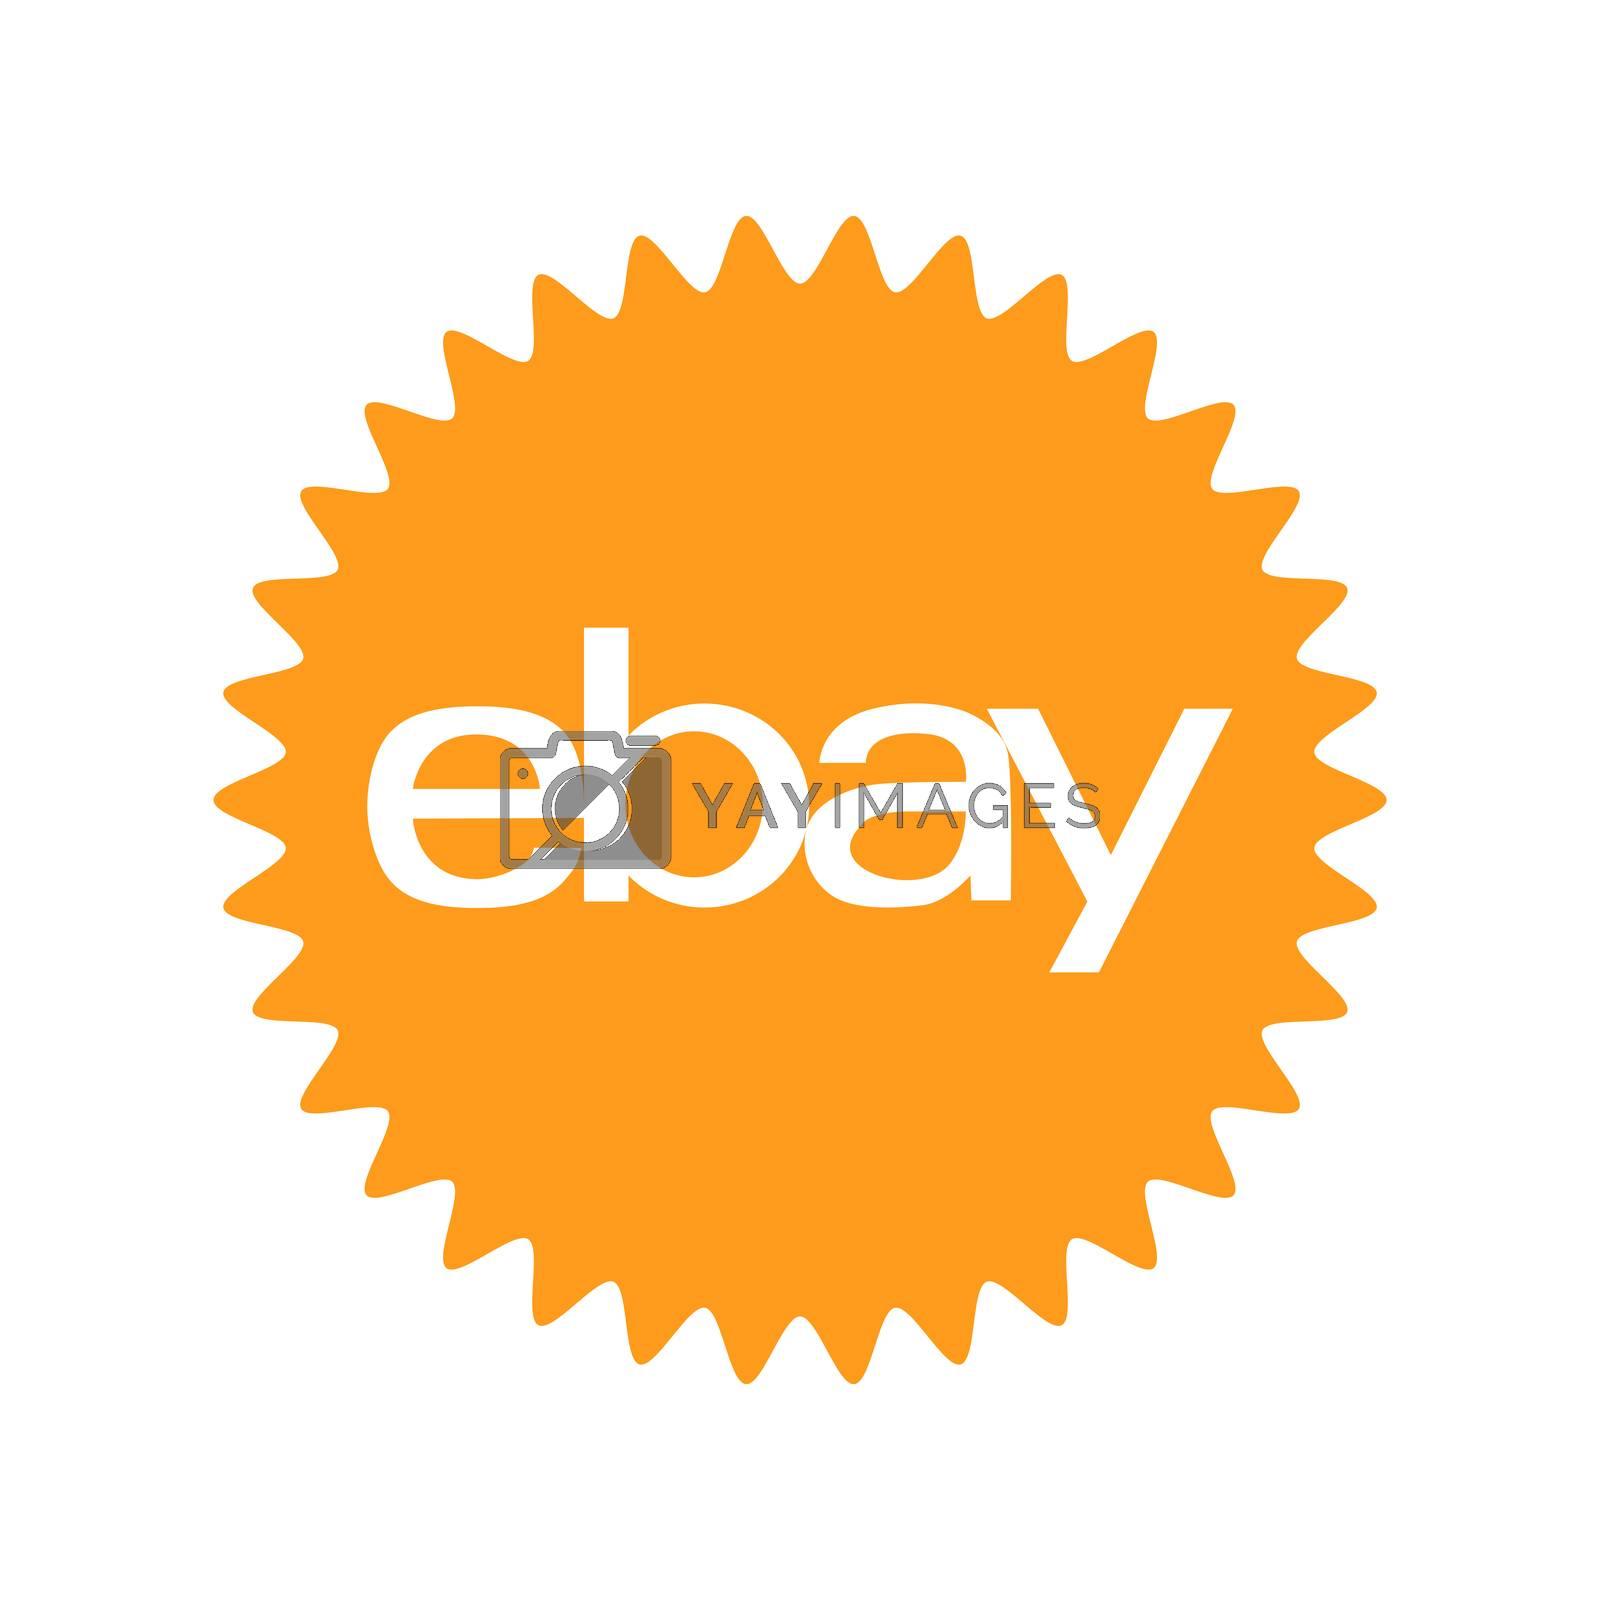 Ebay logo. Ebay is an American corporation and e-commerce company. Providing sales services. Ebay leader in e-commerce . Kharkiv, Ukraine - June, 2020